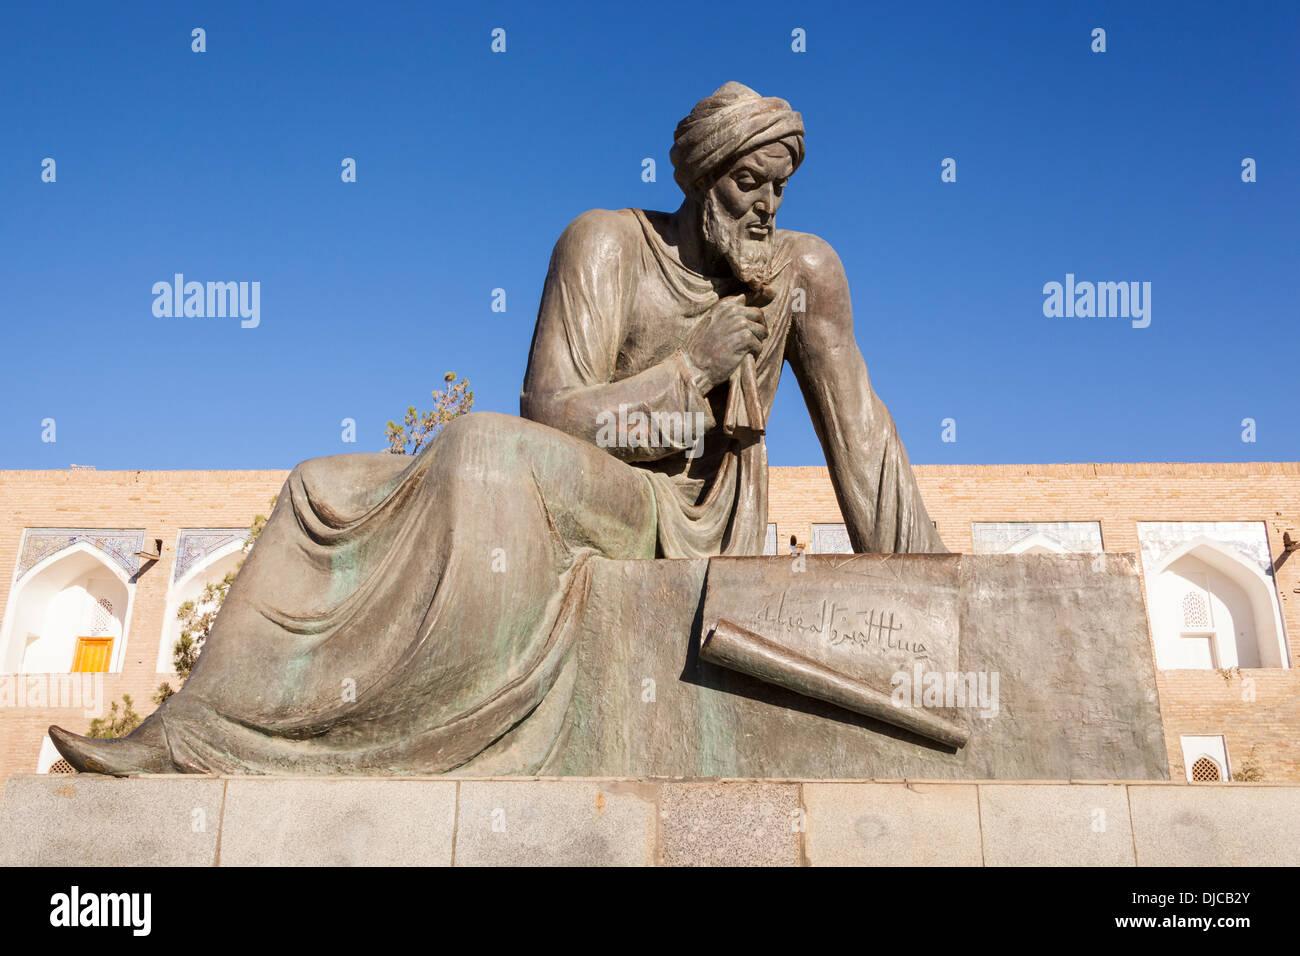 Statue of Al Khwarizmi, a ninth century mathematician, Ichan Kala, Khiva, Uzbekistan - Stock Image